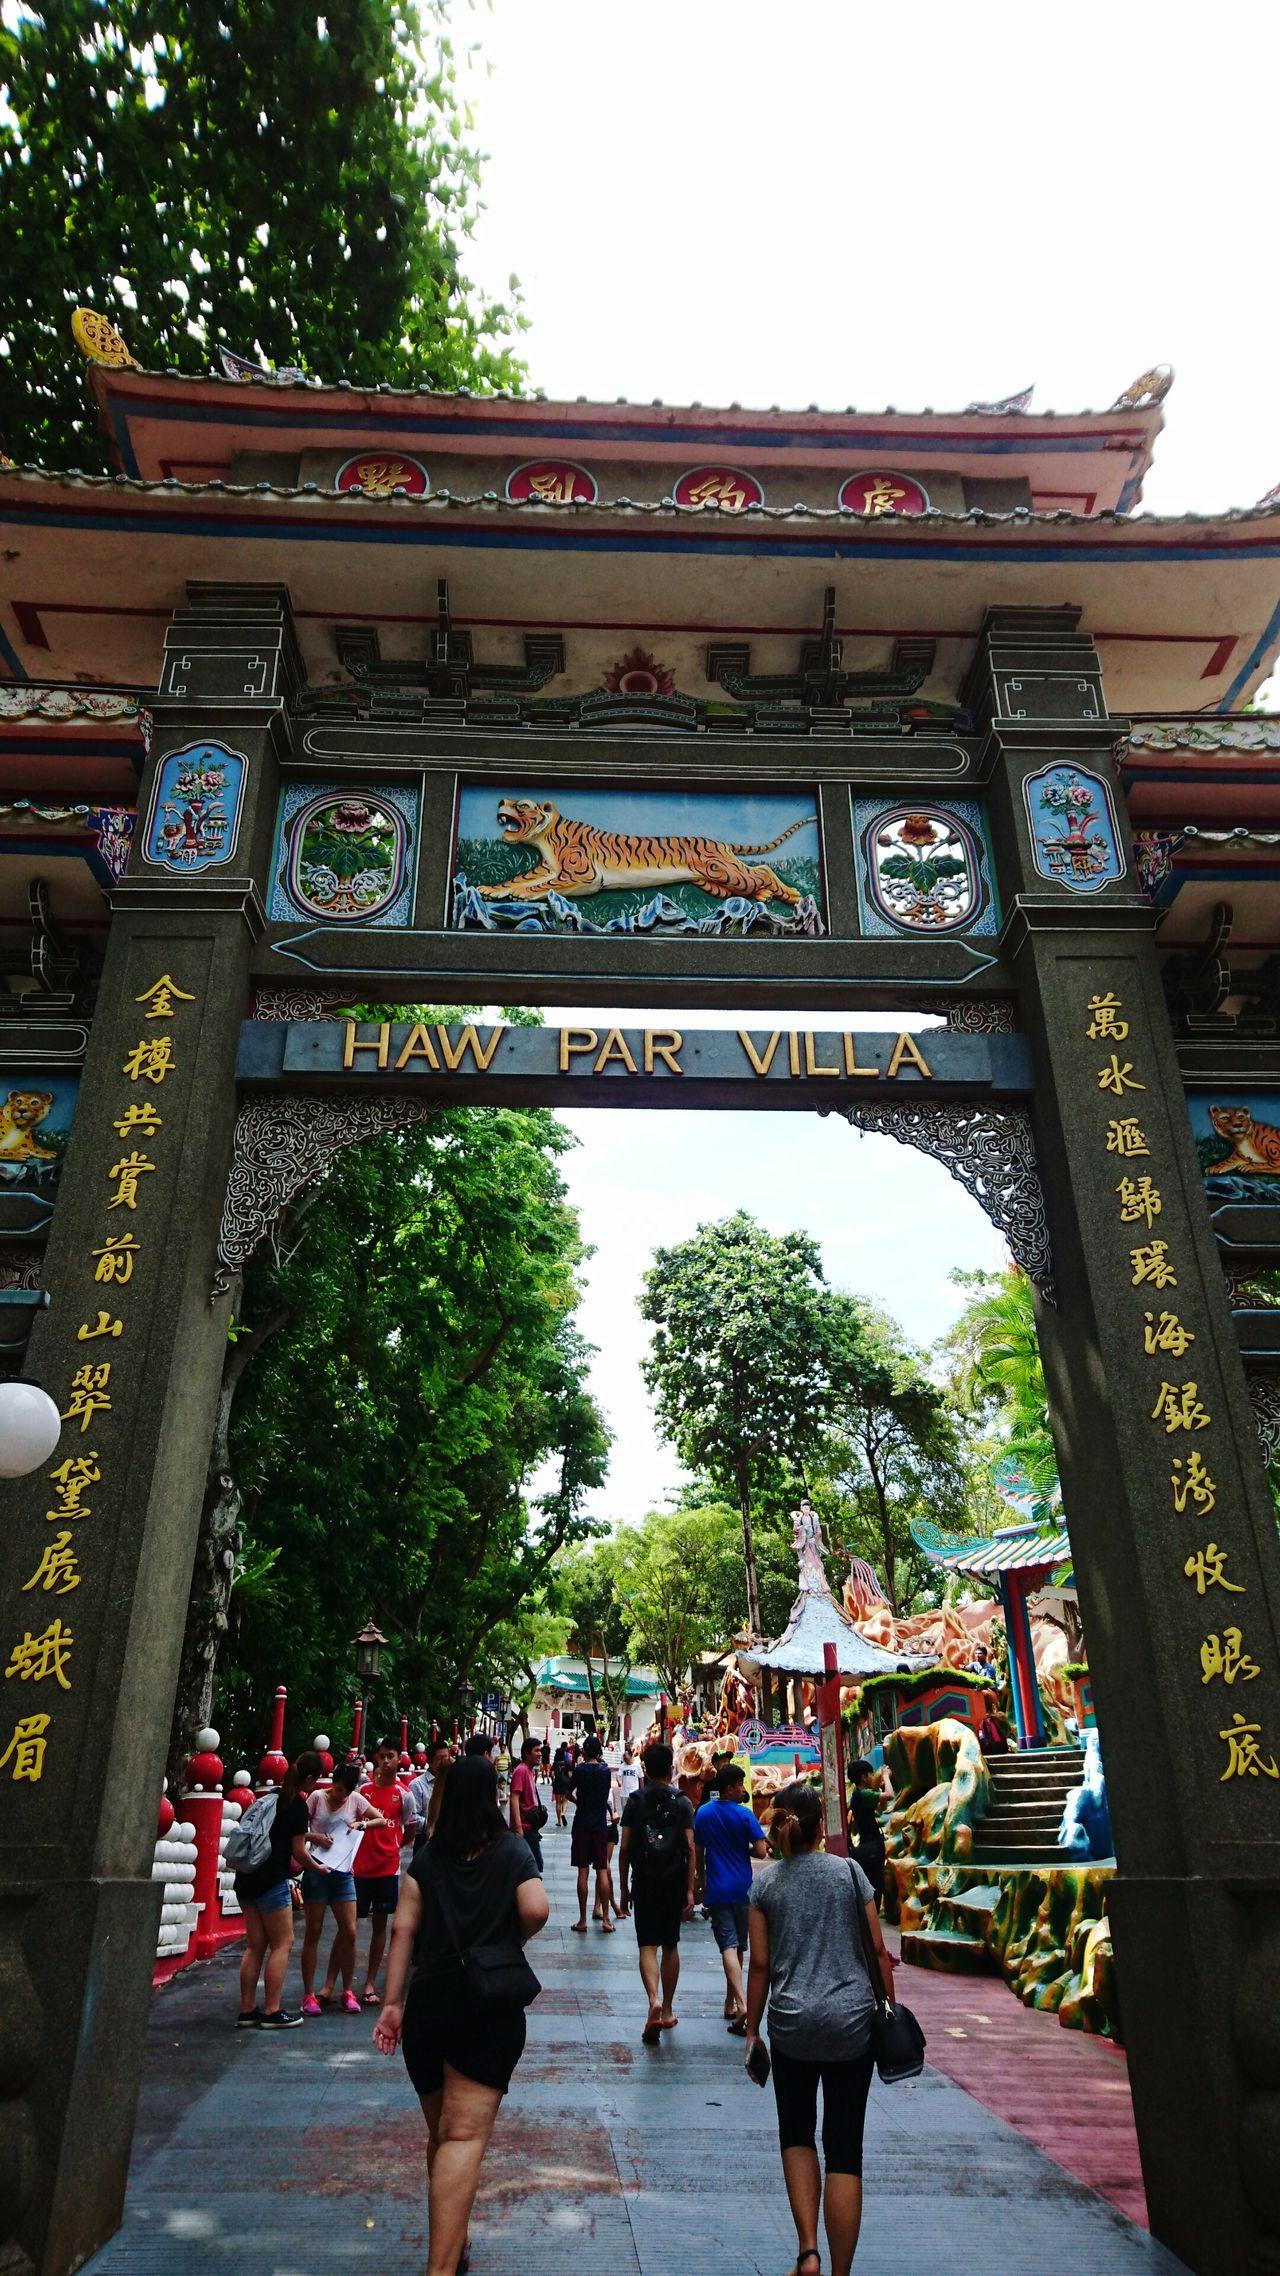 Hawparvilla Singapore Entry